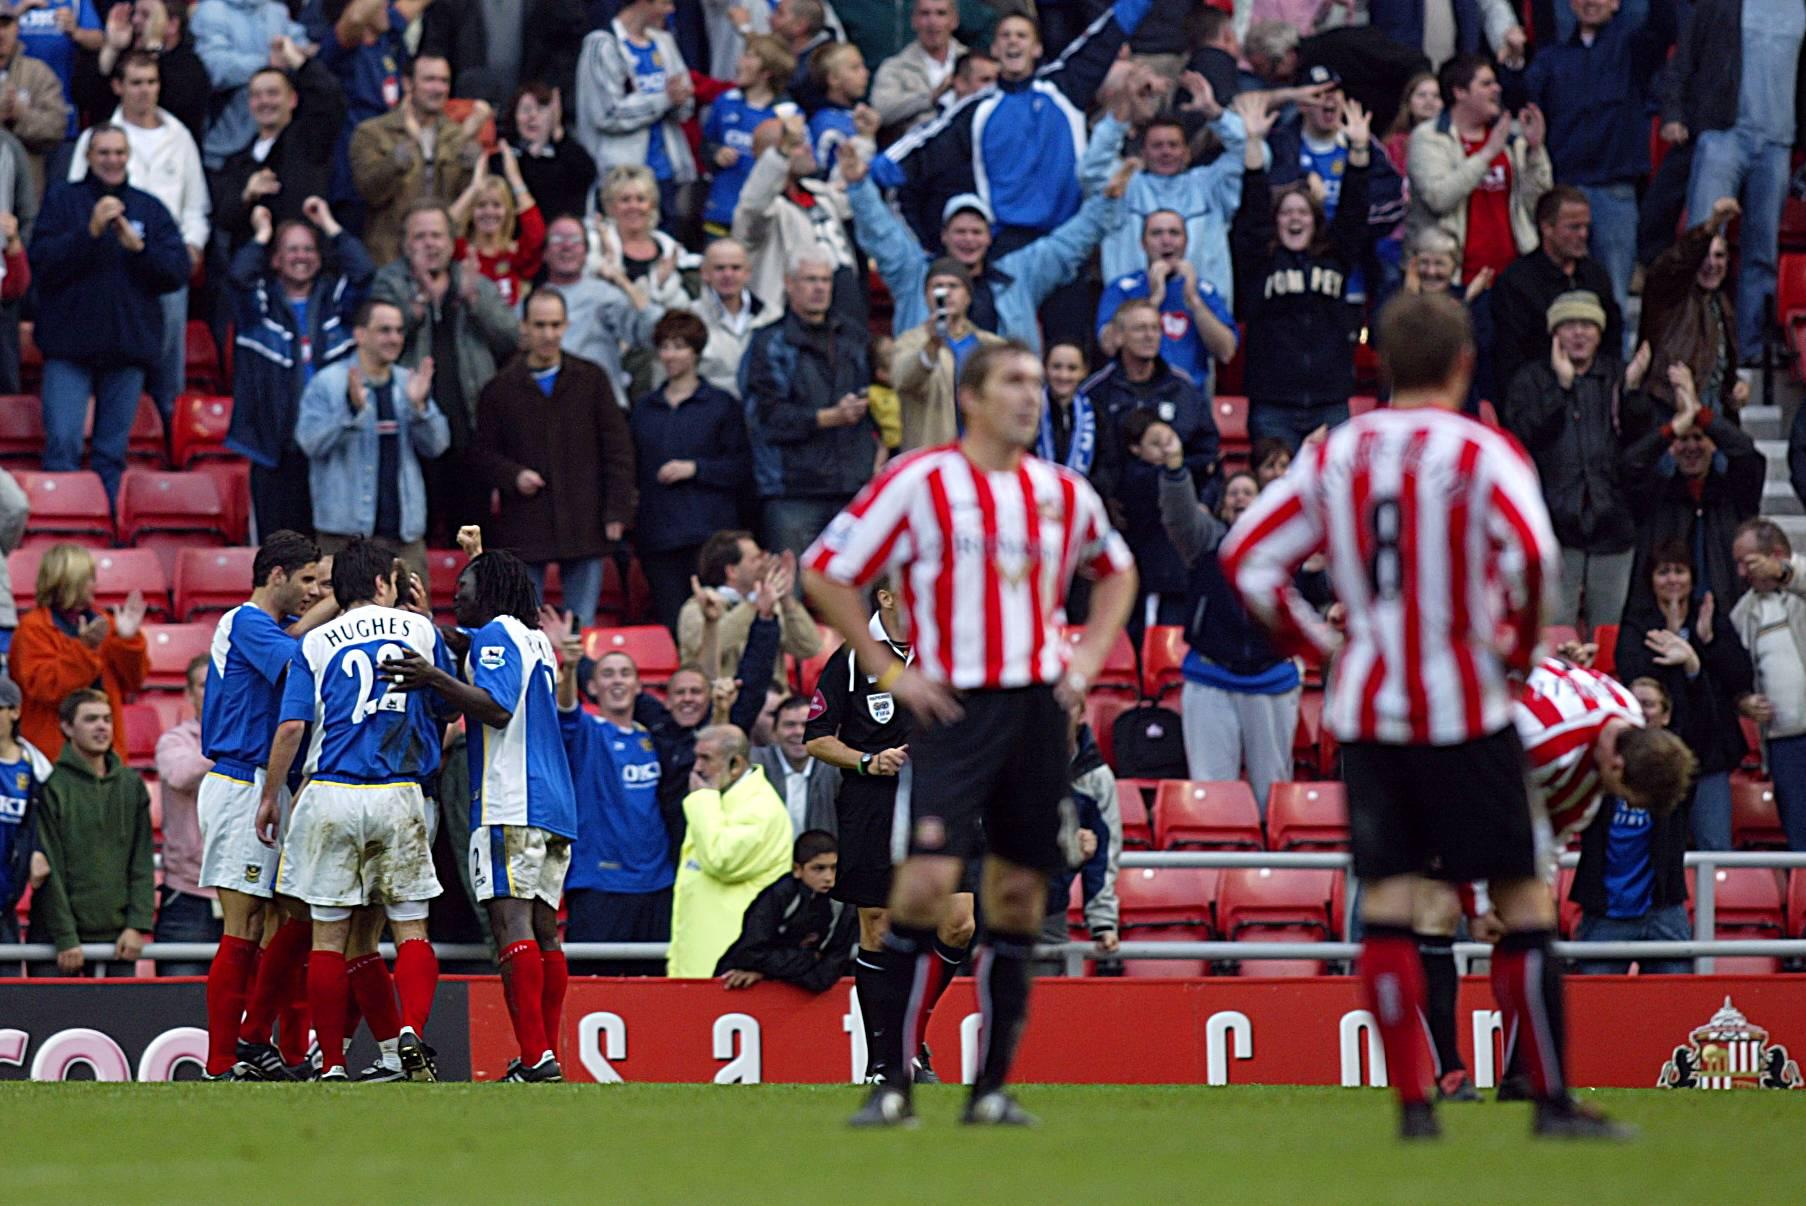 Soccer - FA Barclays Premiership - Sunderland v Portsmouth - The Stadium of Light